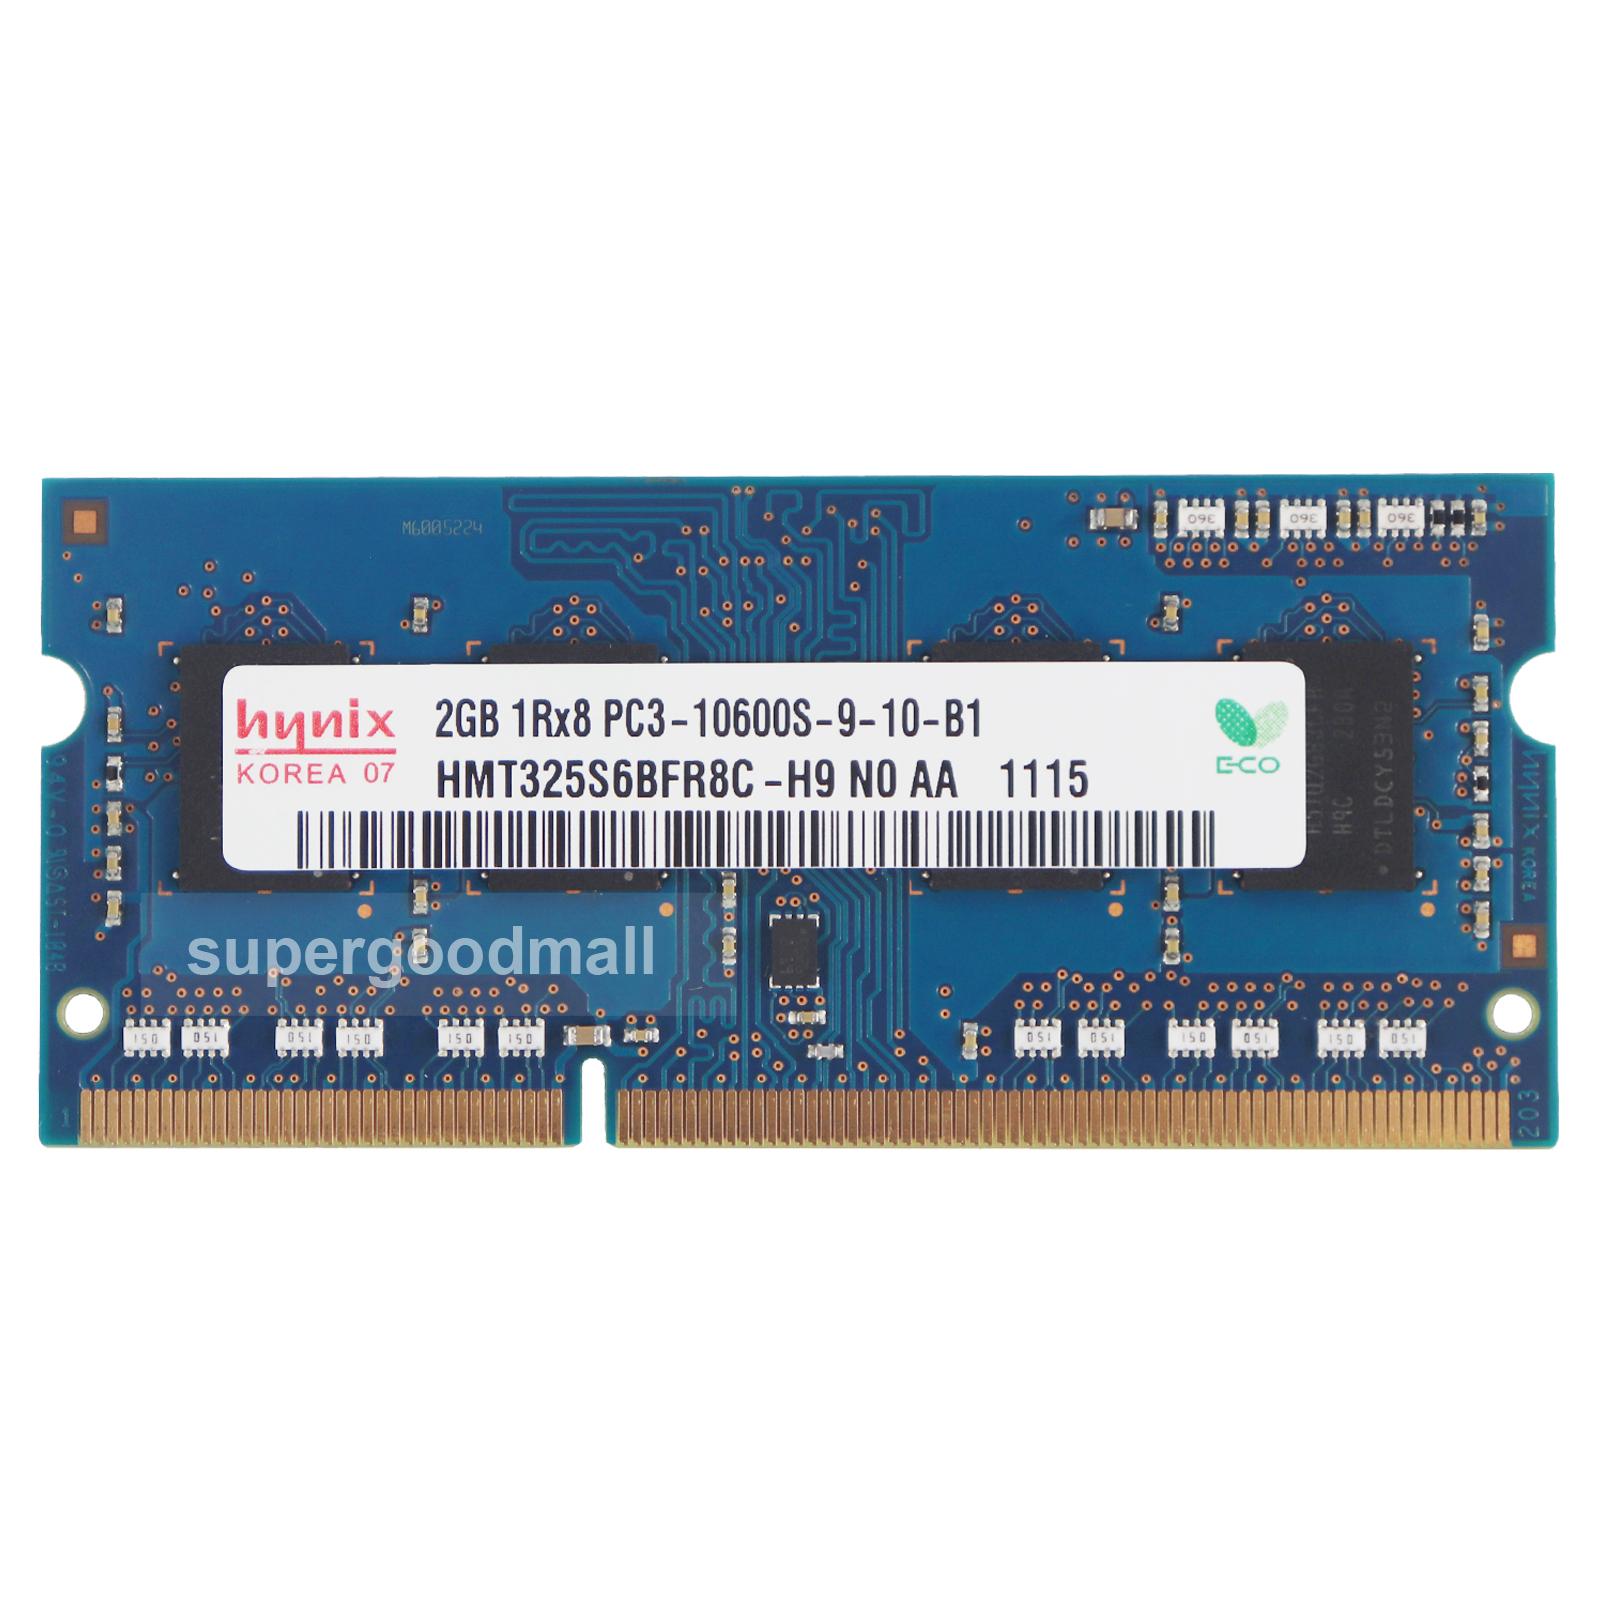 For Hynix 2GB 1RX8 PC3-10600S DDR3-1333Mhz 204Pin SODIMM Laptop Memory RAM